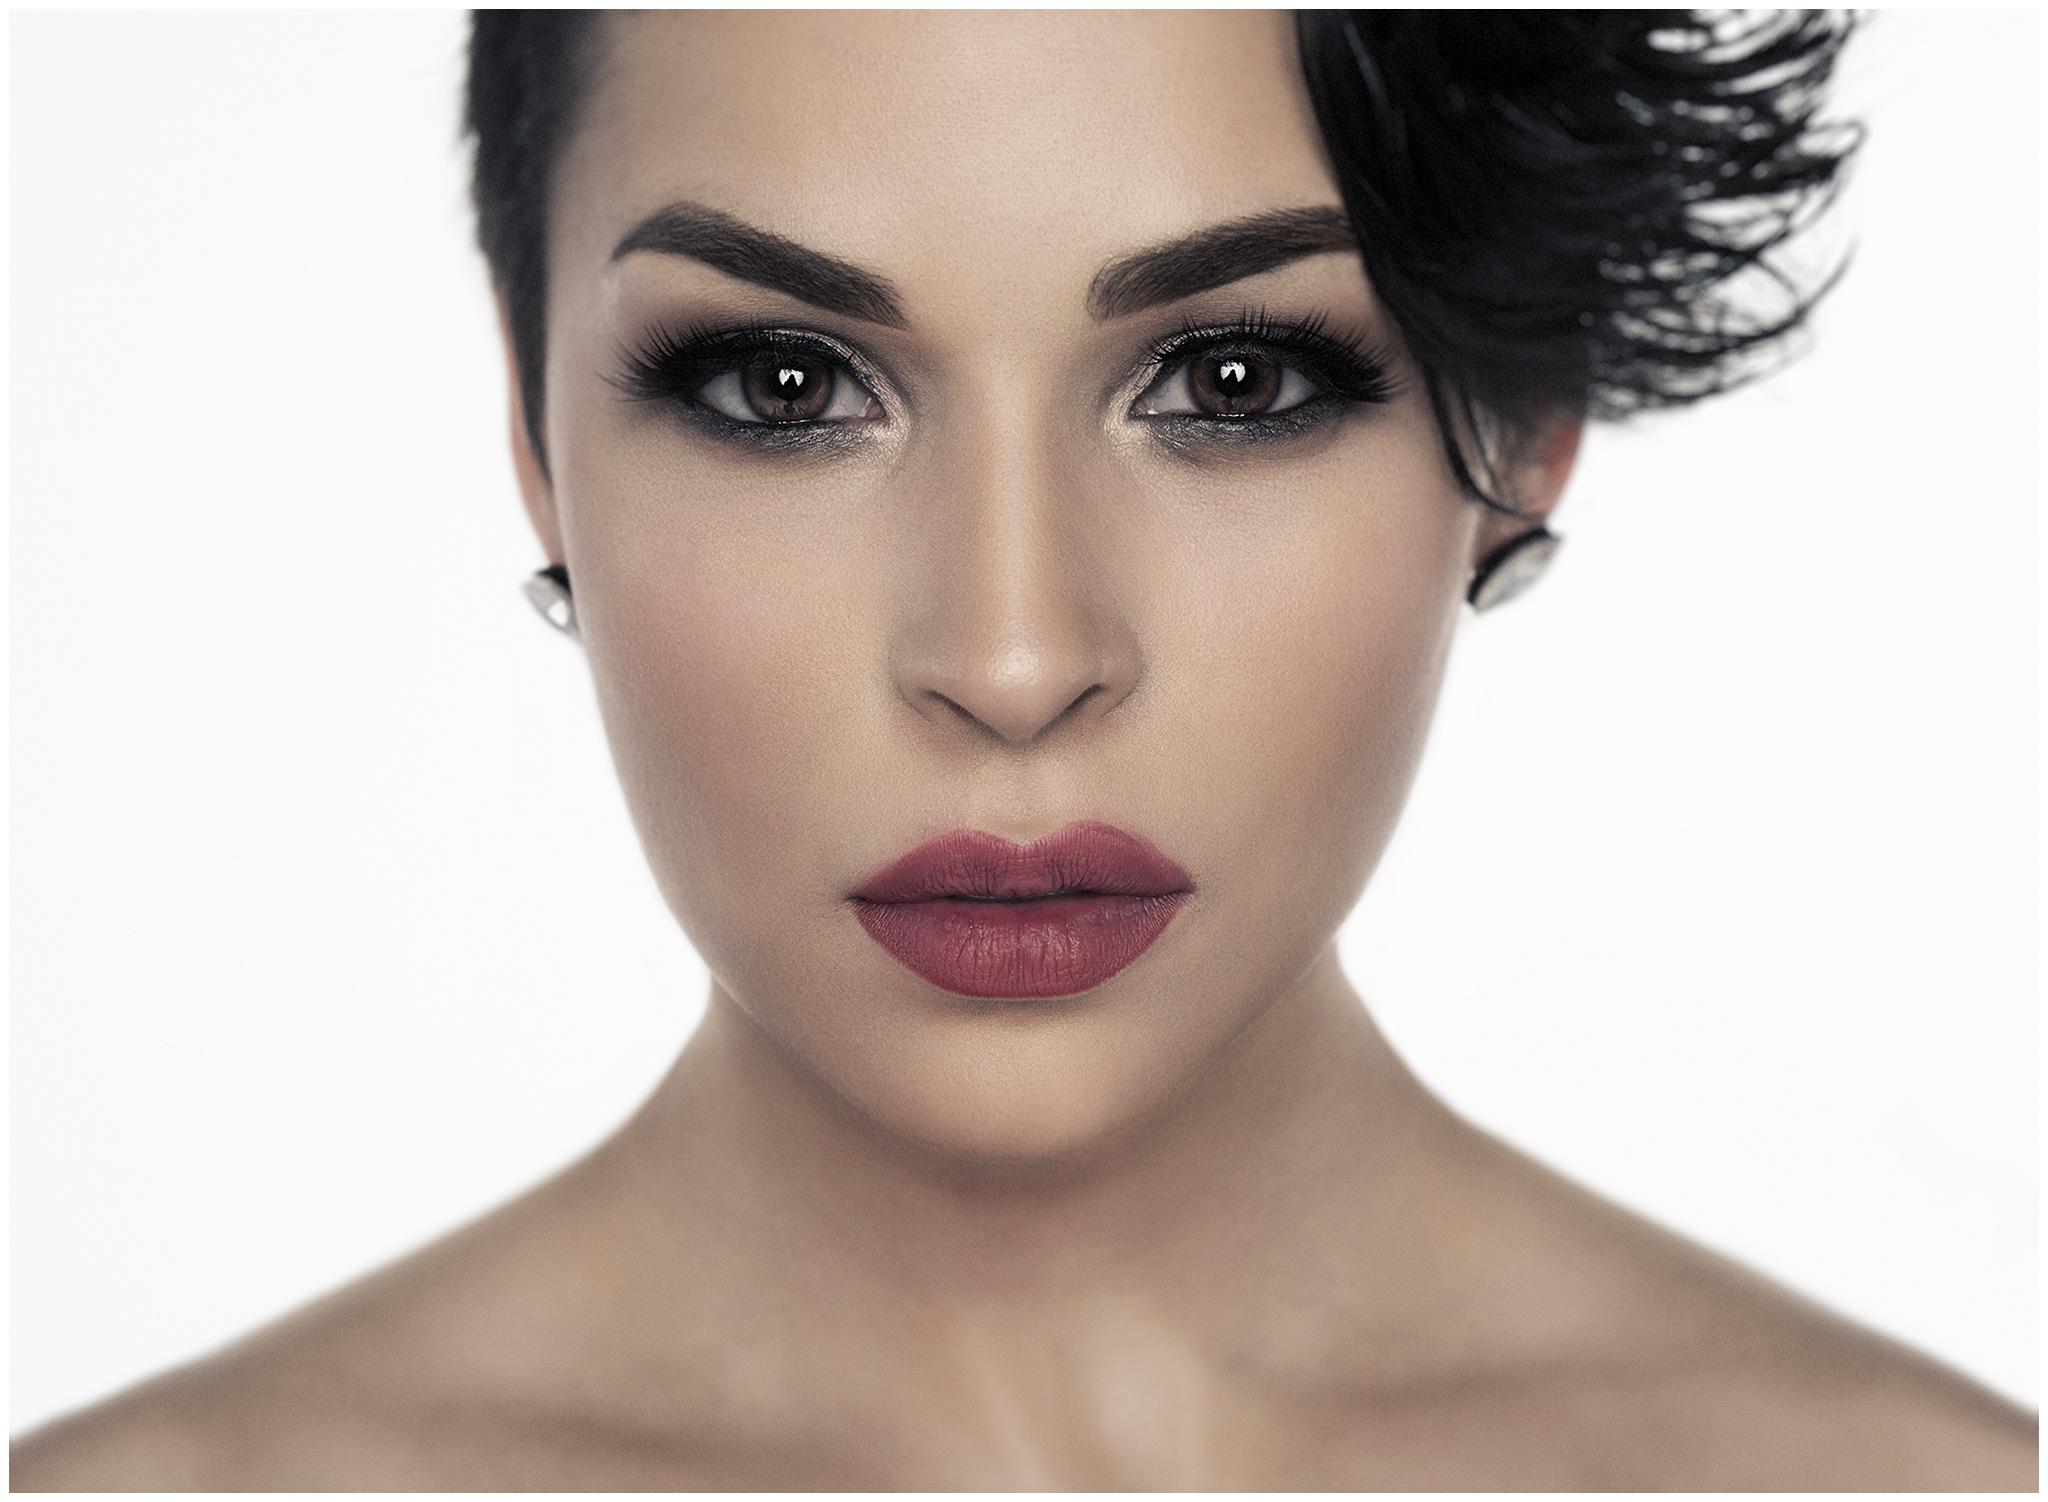 Portrait of Atlanta Model Madeline Suarez by Richard Cawood